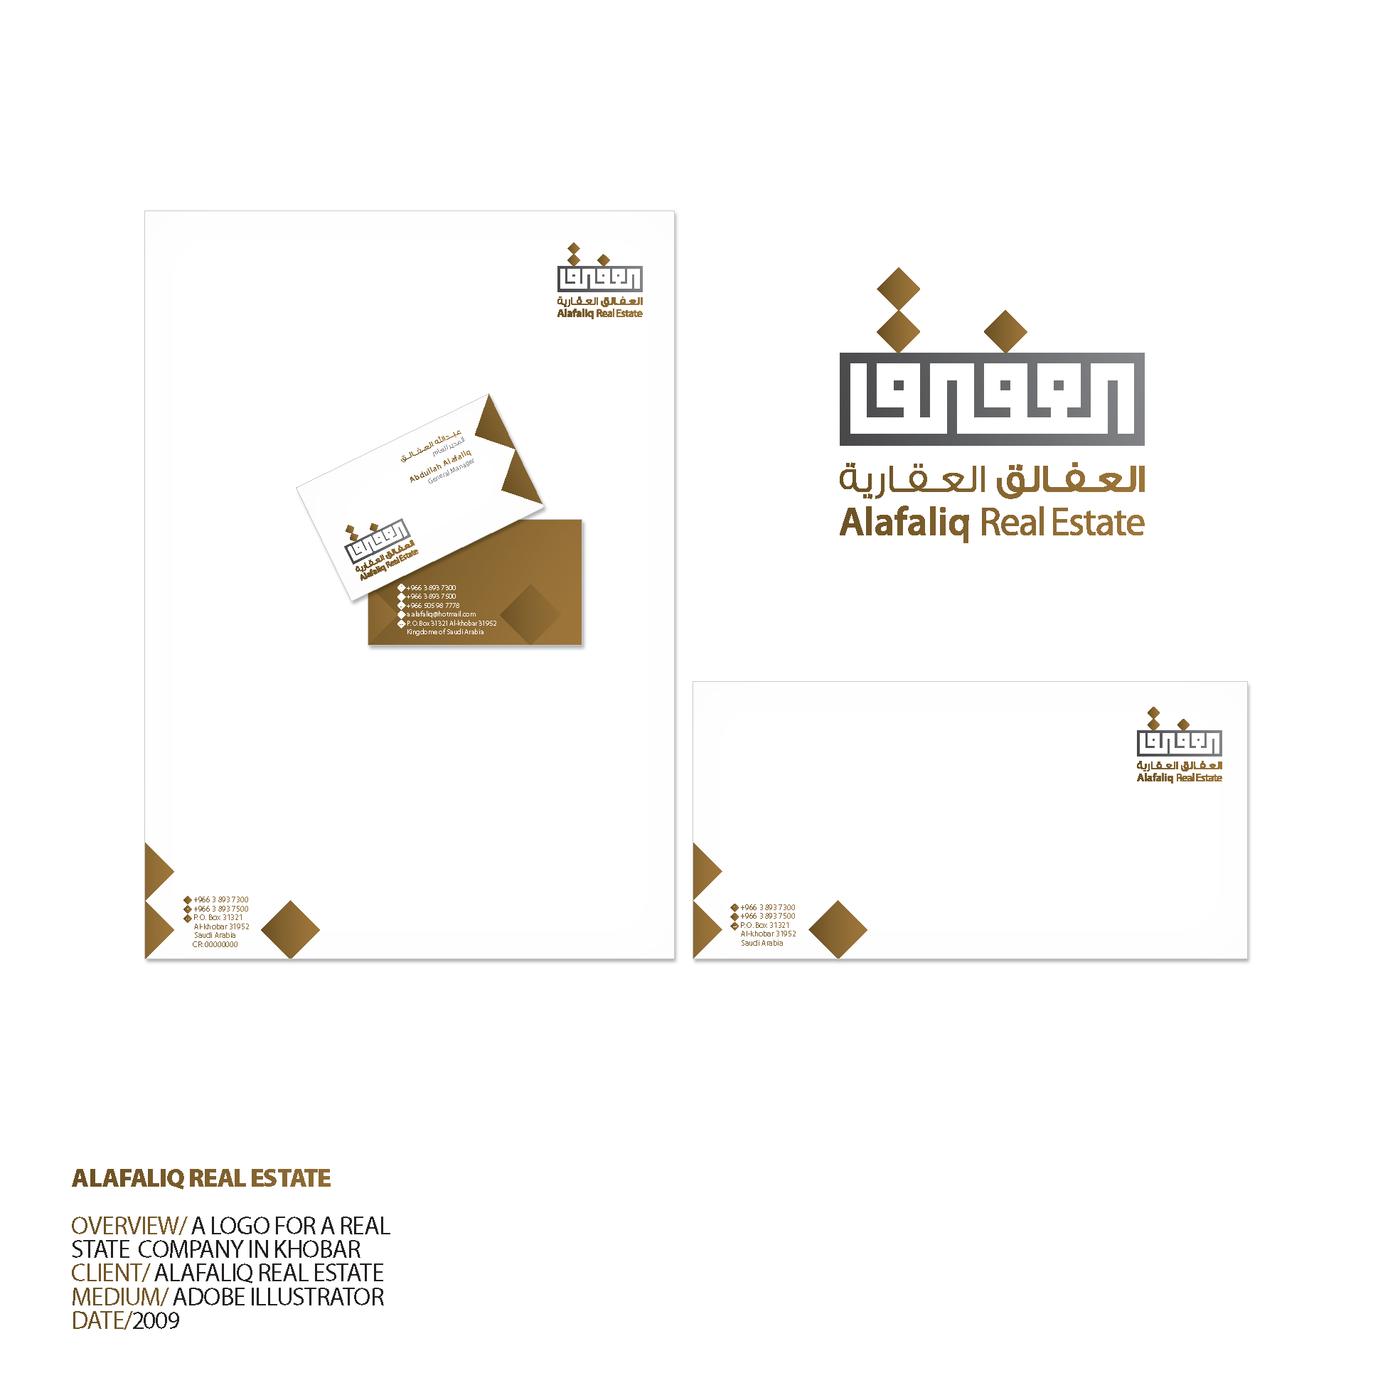 logo_portfolio_2010 by Ahmed Alabdullatif at Coroflot com